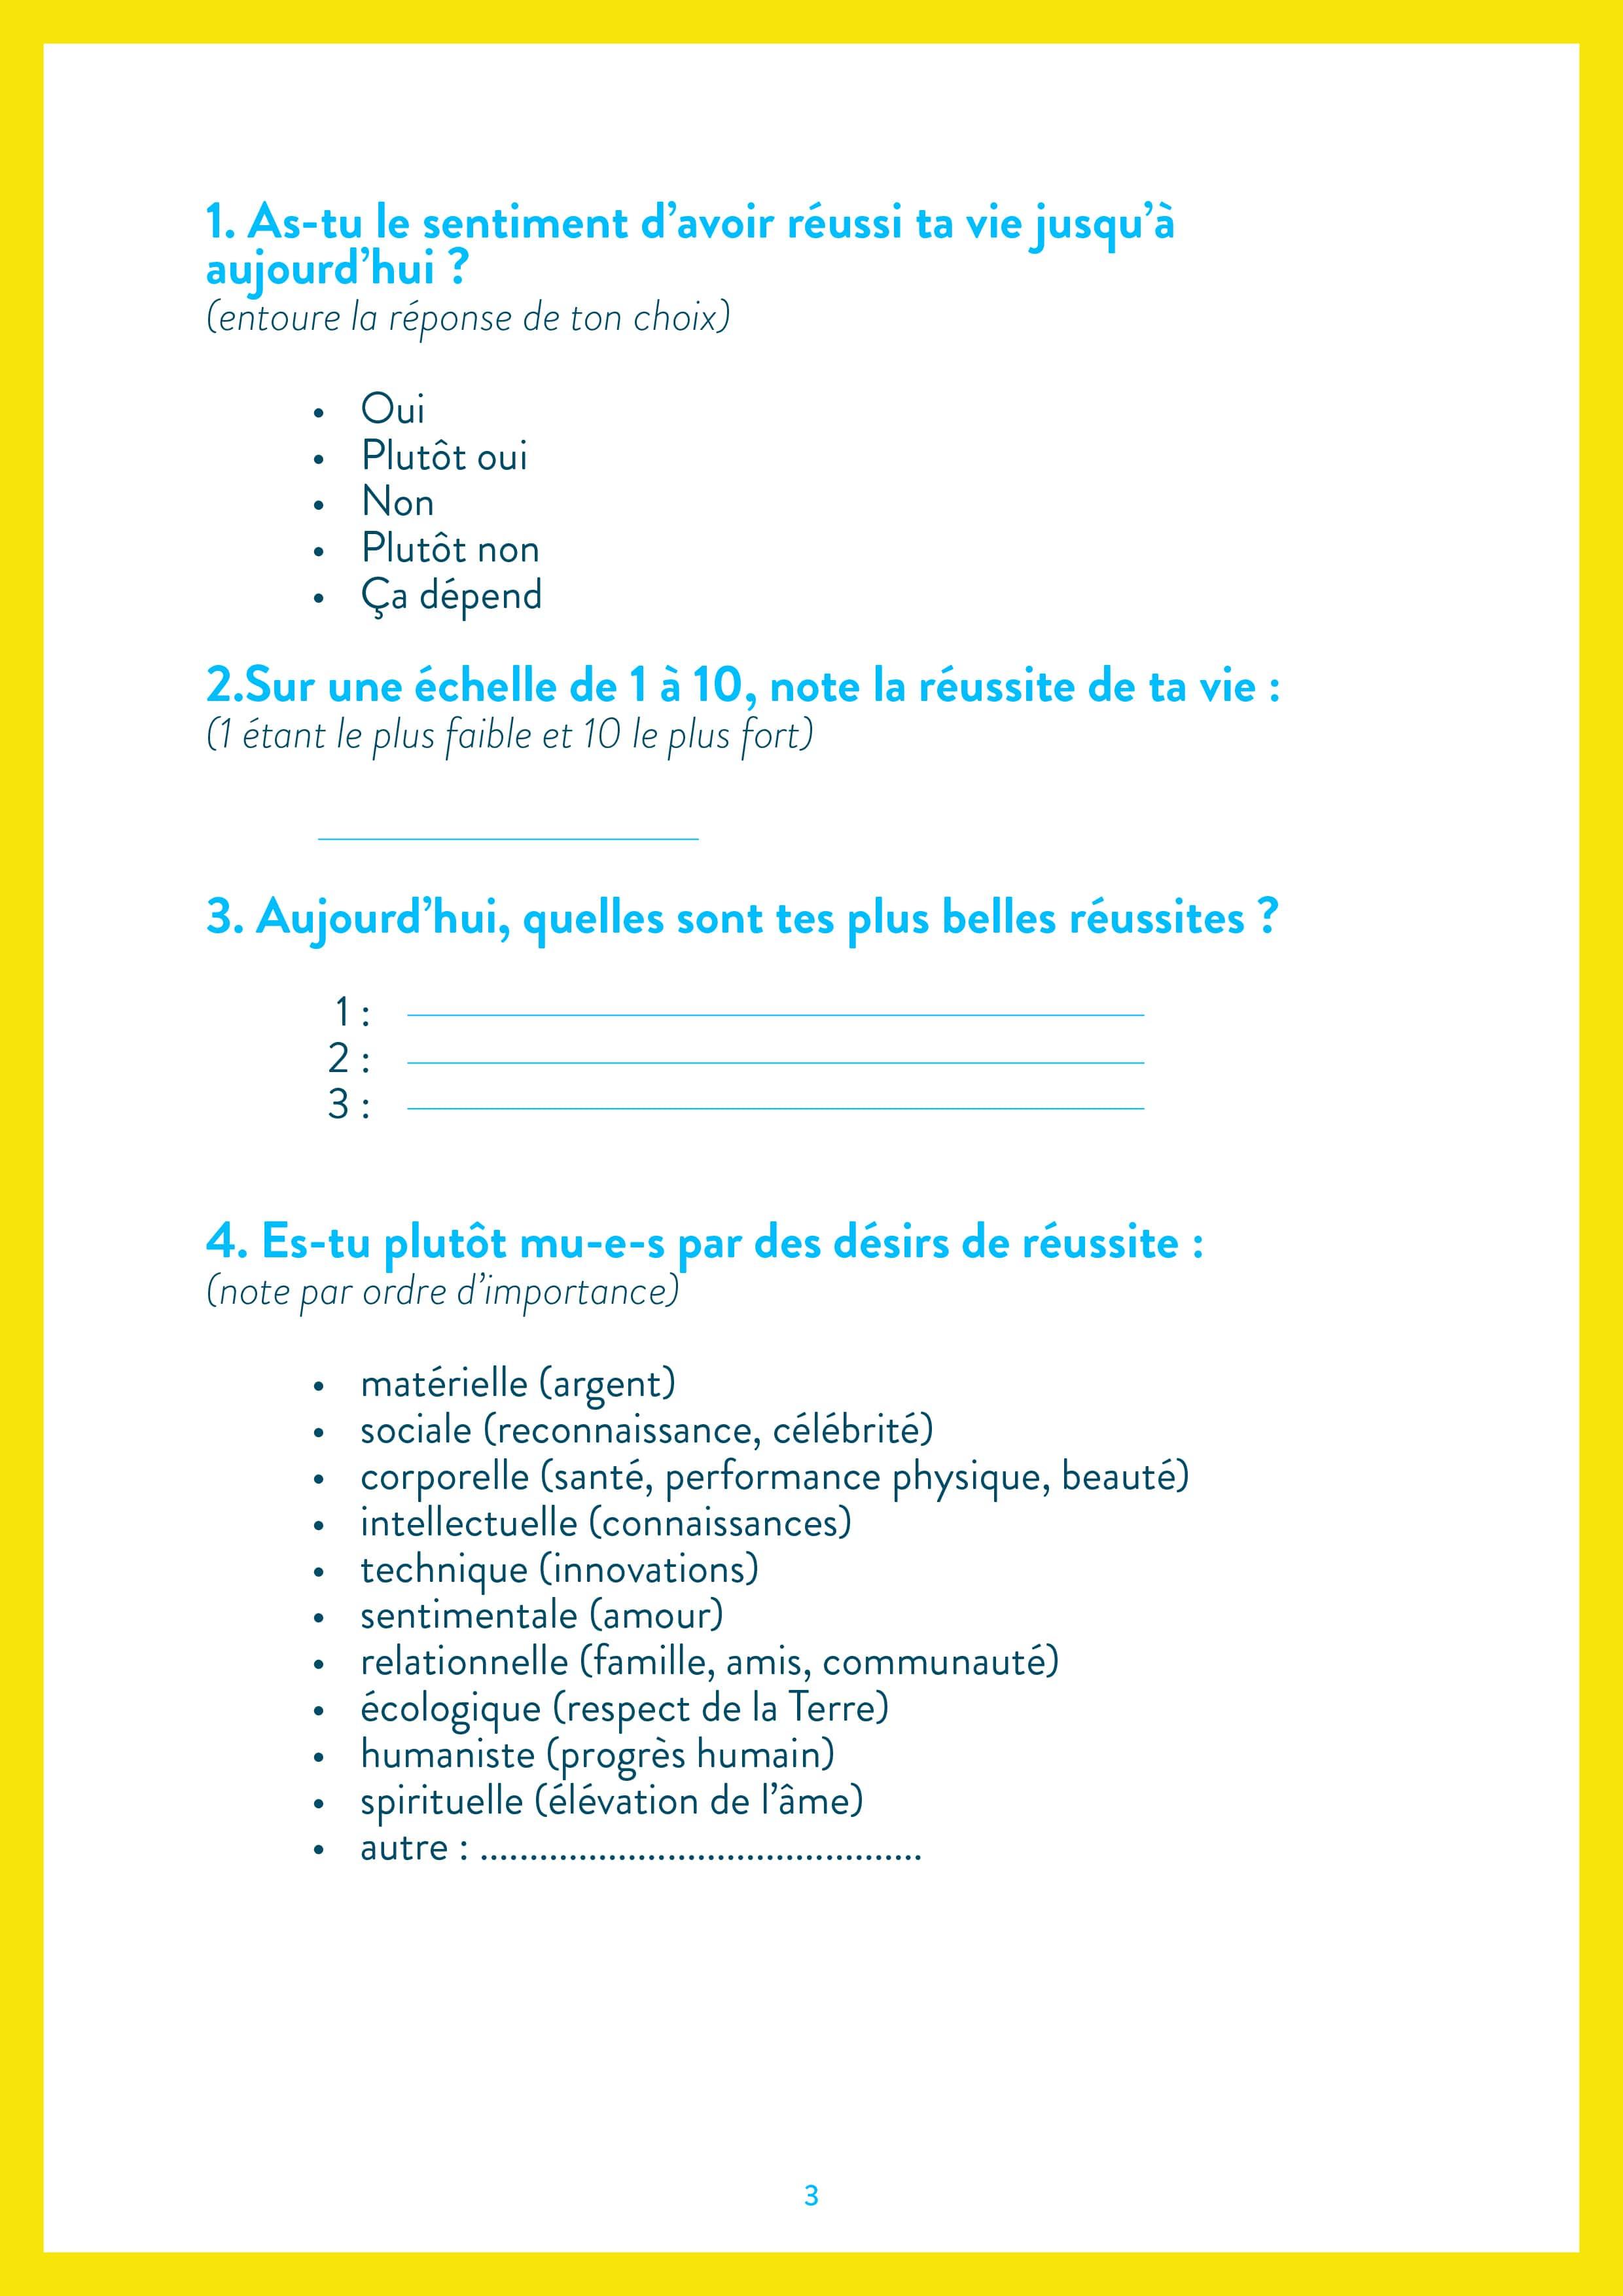 E-coaching-Cahierdexo-reussirsavie-serie1-3.jpg